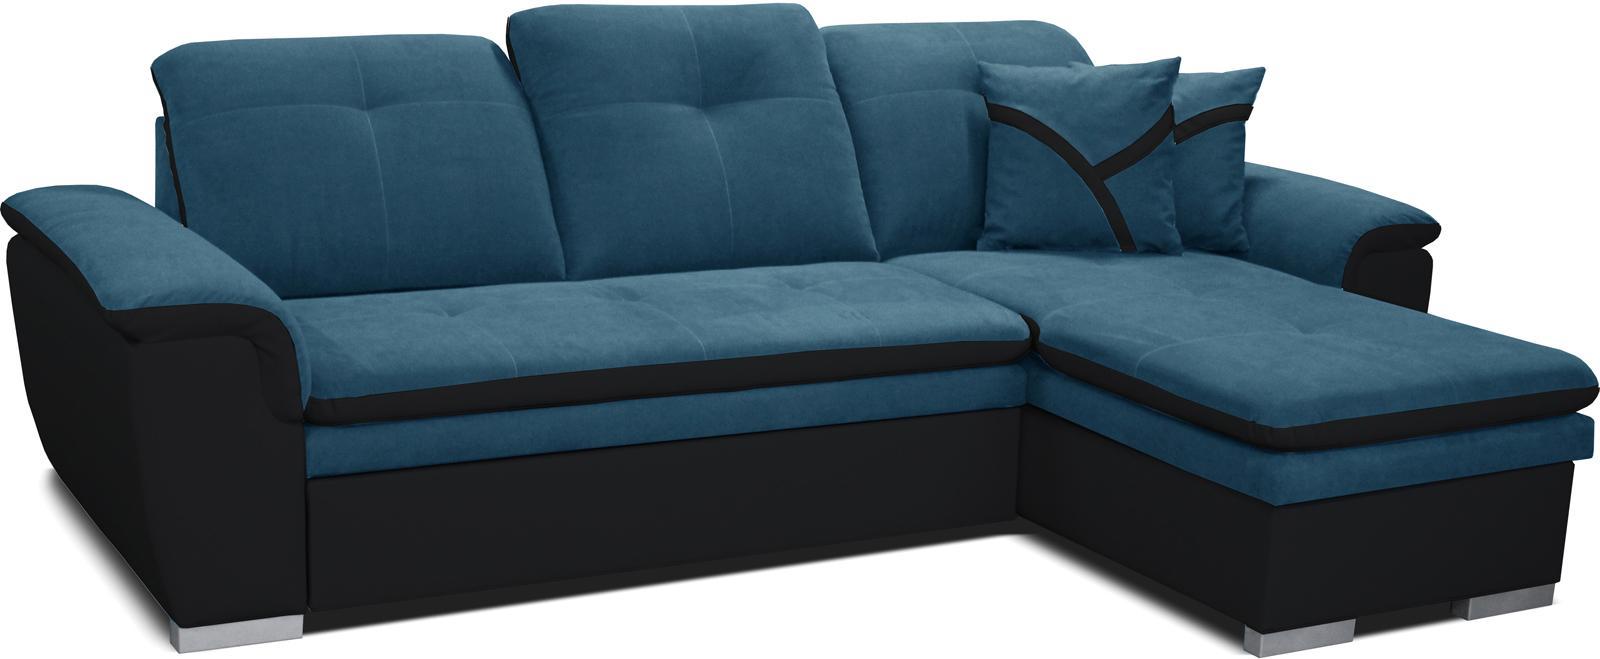 Rohová sedačka Estevan 2F+L (tyrkysová + čierna) (P)